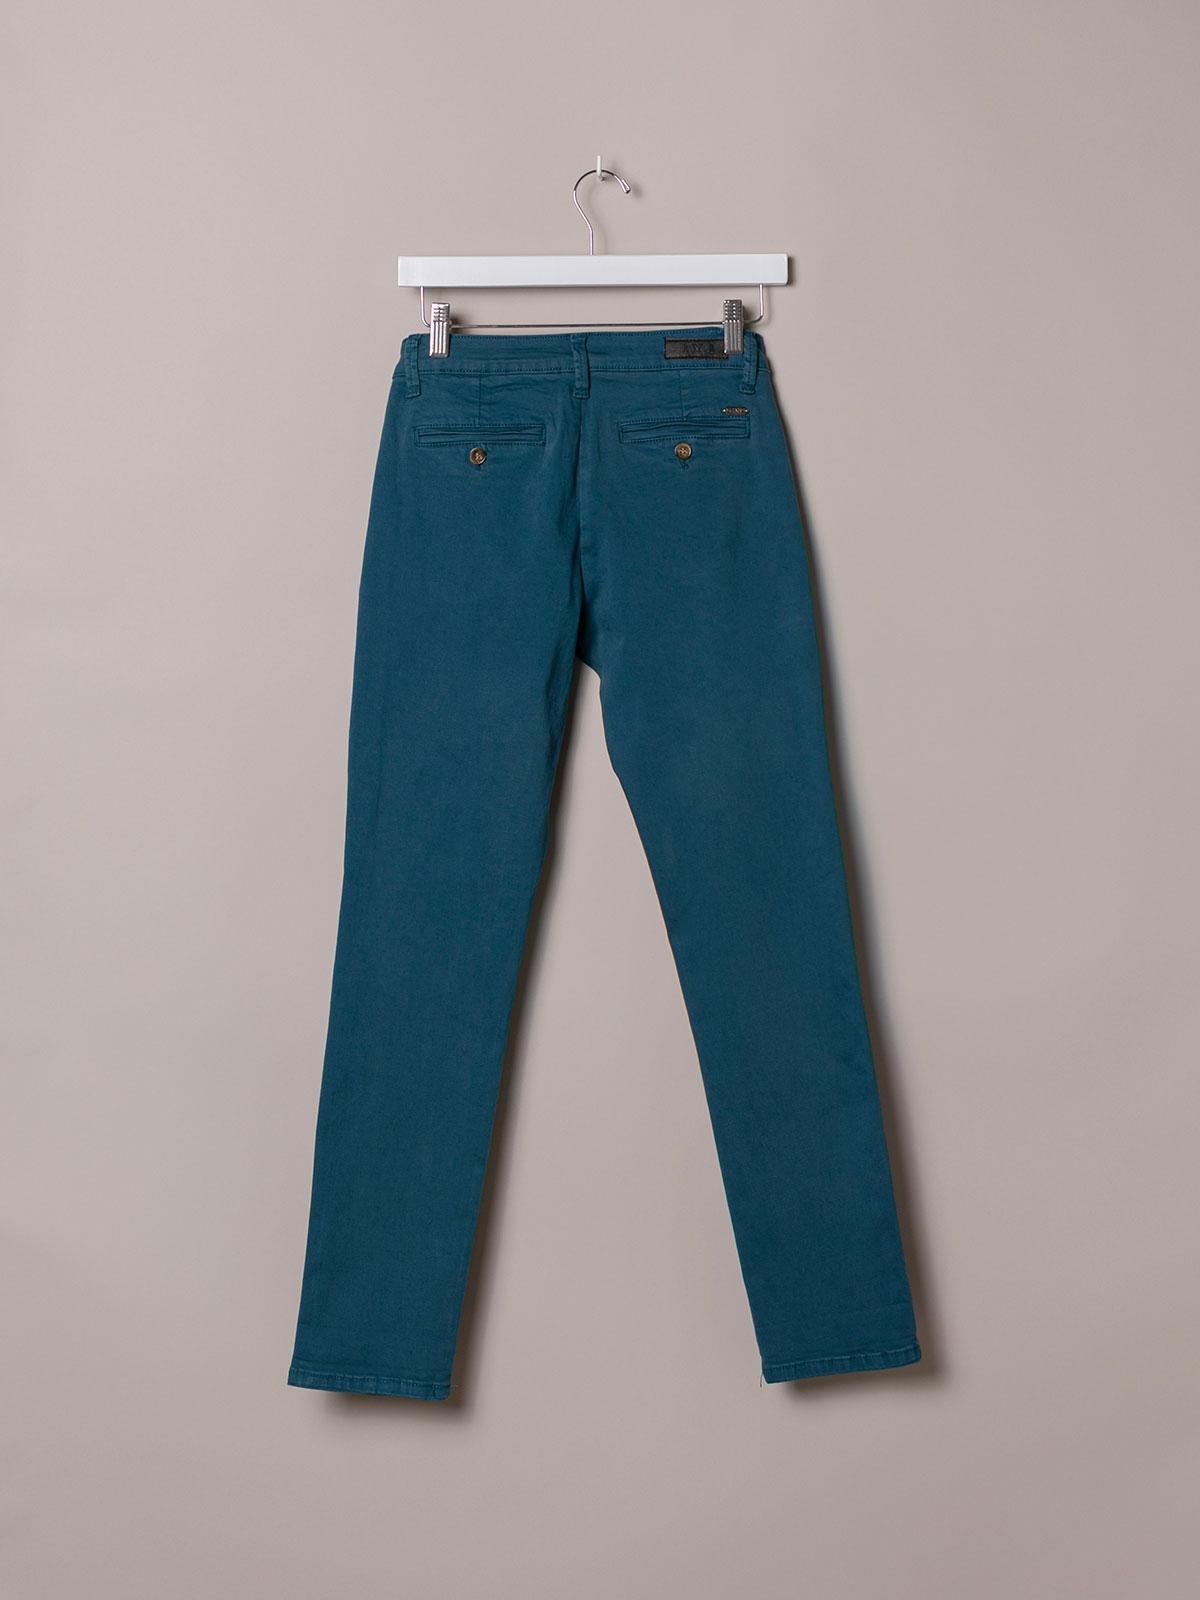 Pantalón chino mujer algodón elastico Azul